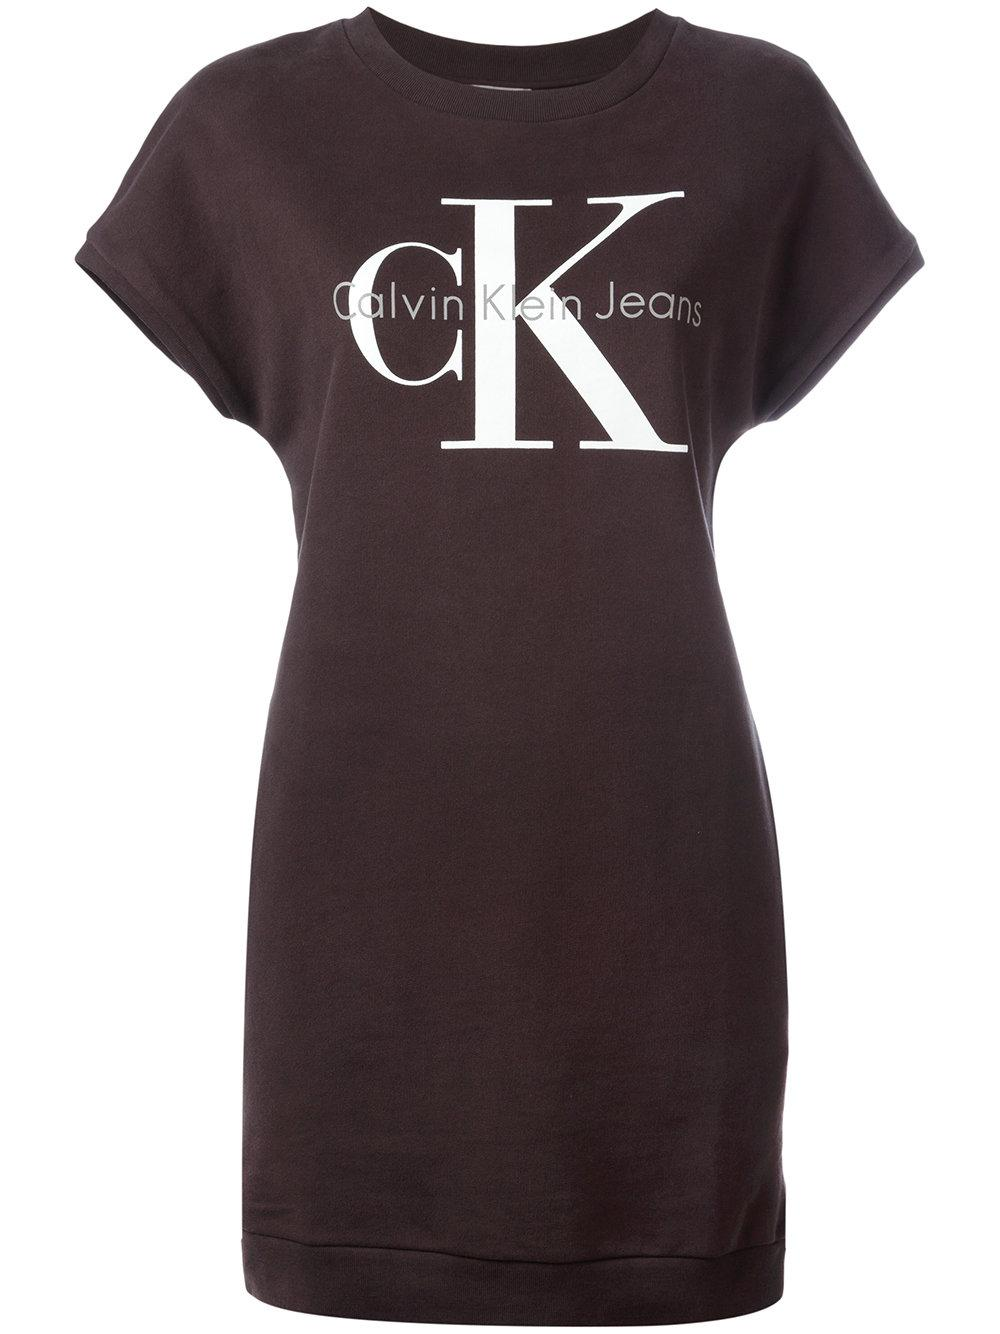 Calvin klein jeans iconic logo t shirt dress women for Logo t shirt dress